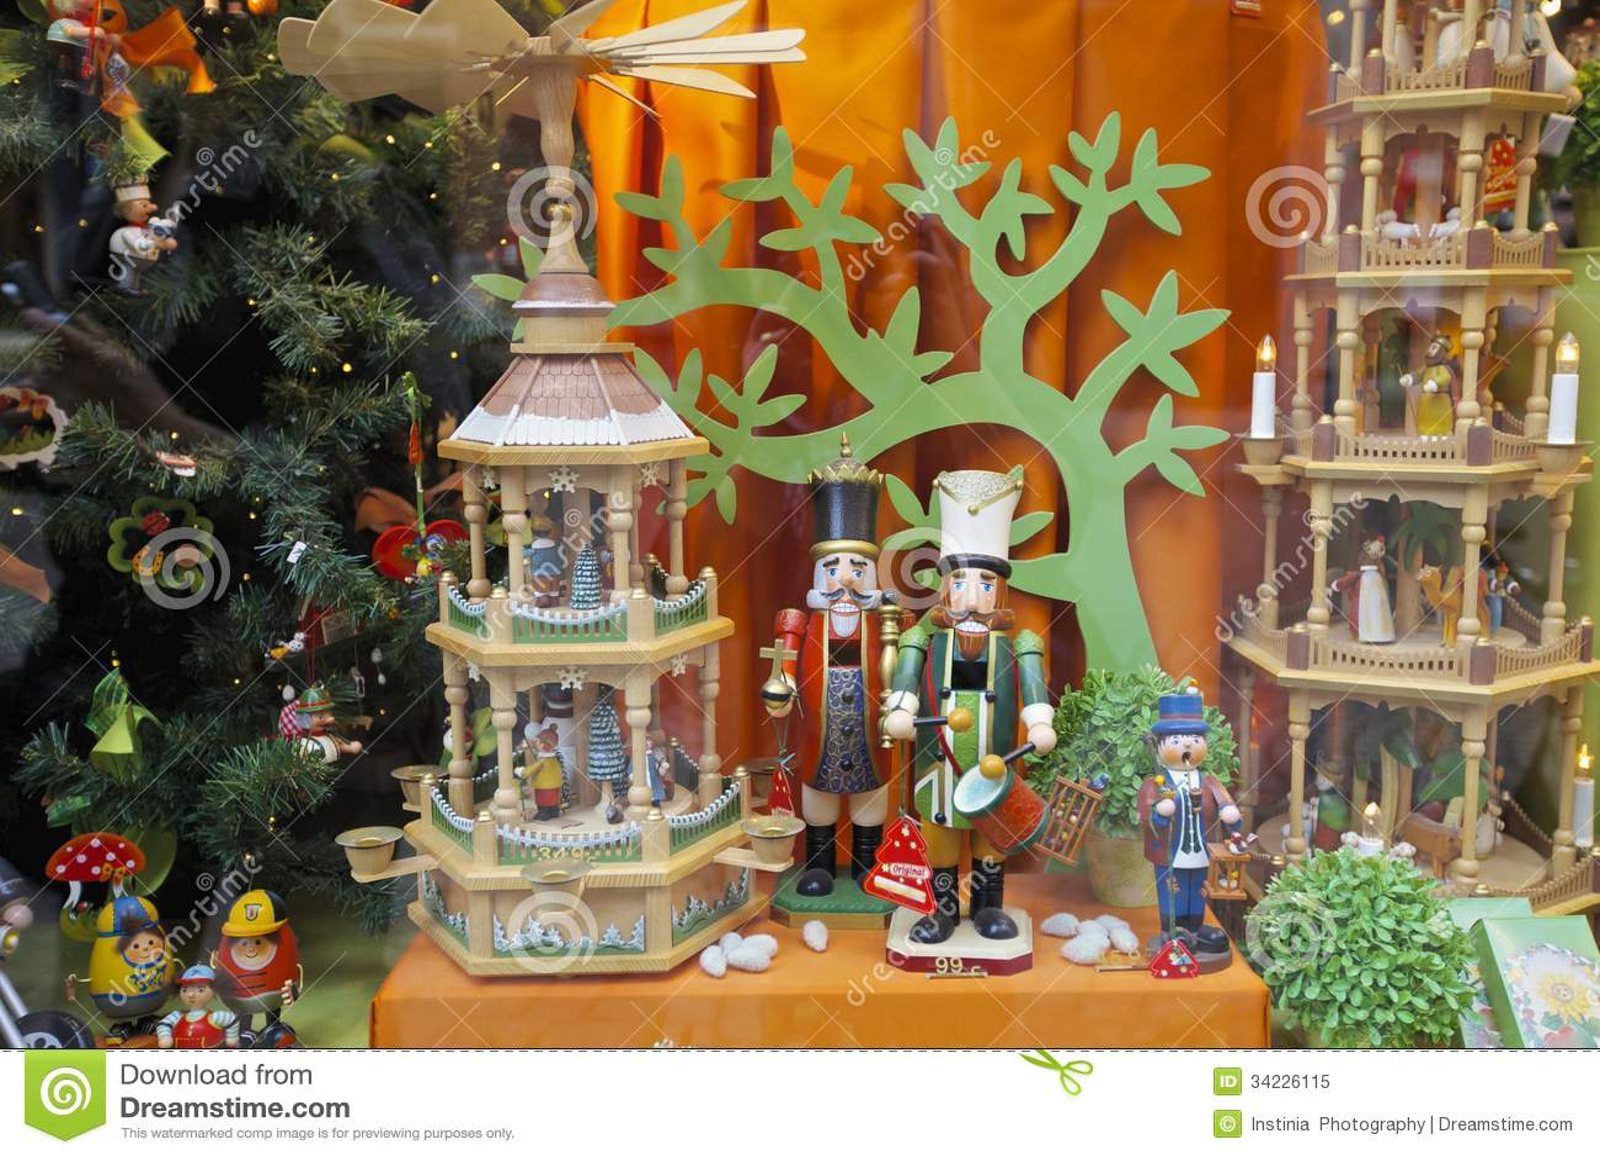 Christmas store window decorations - Christmas Shop Window Royalty Free Stock Photo